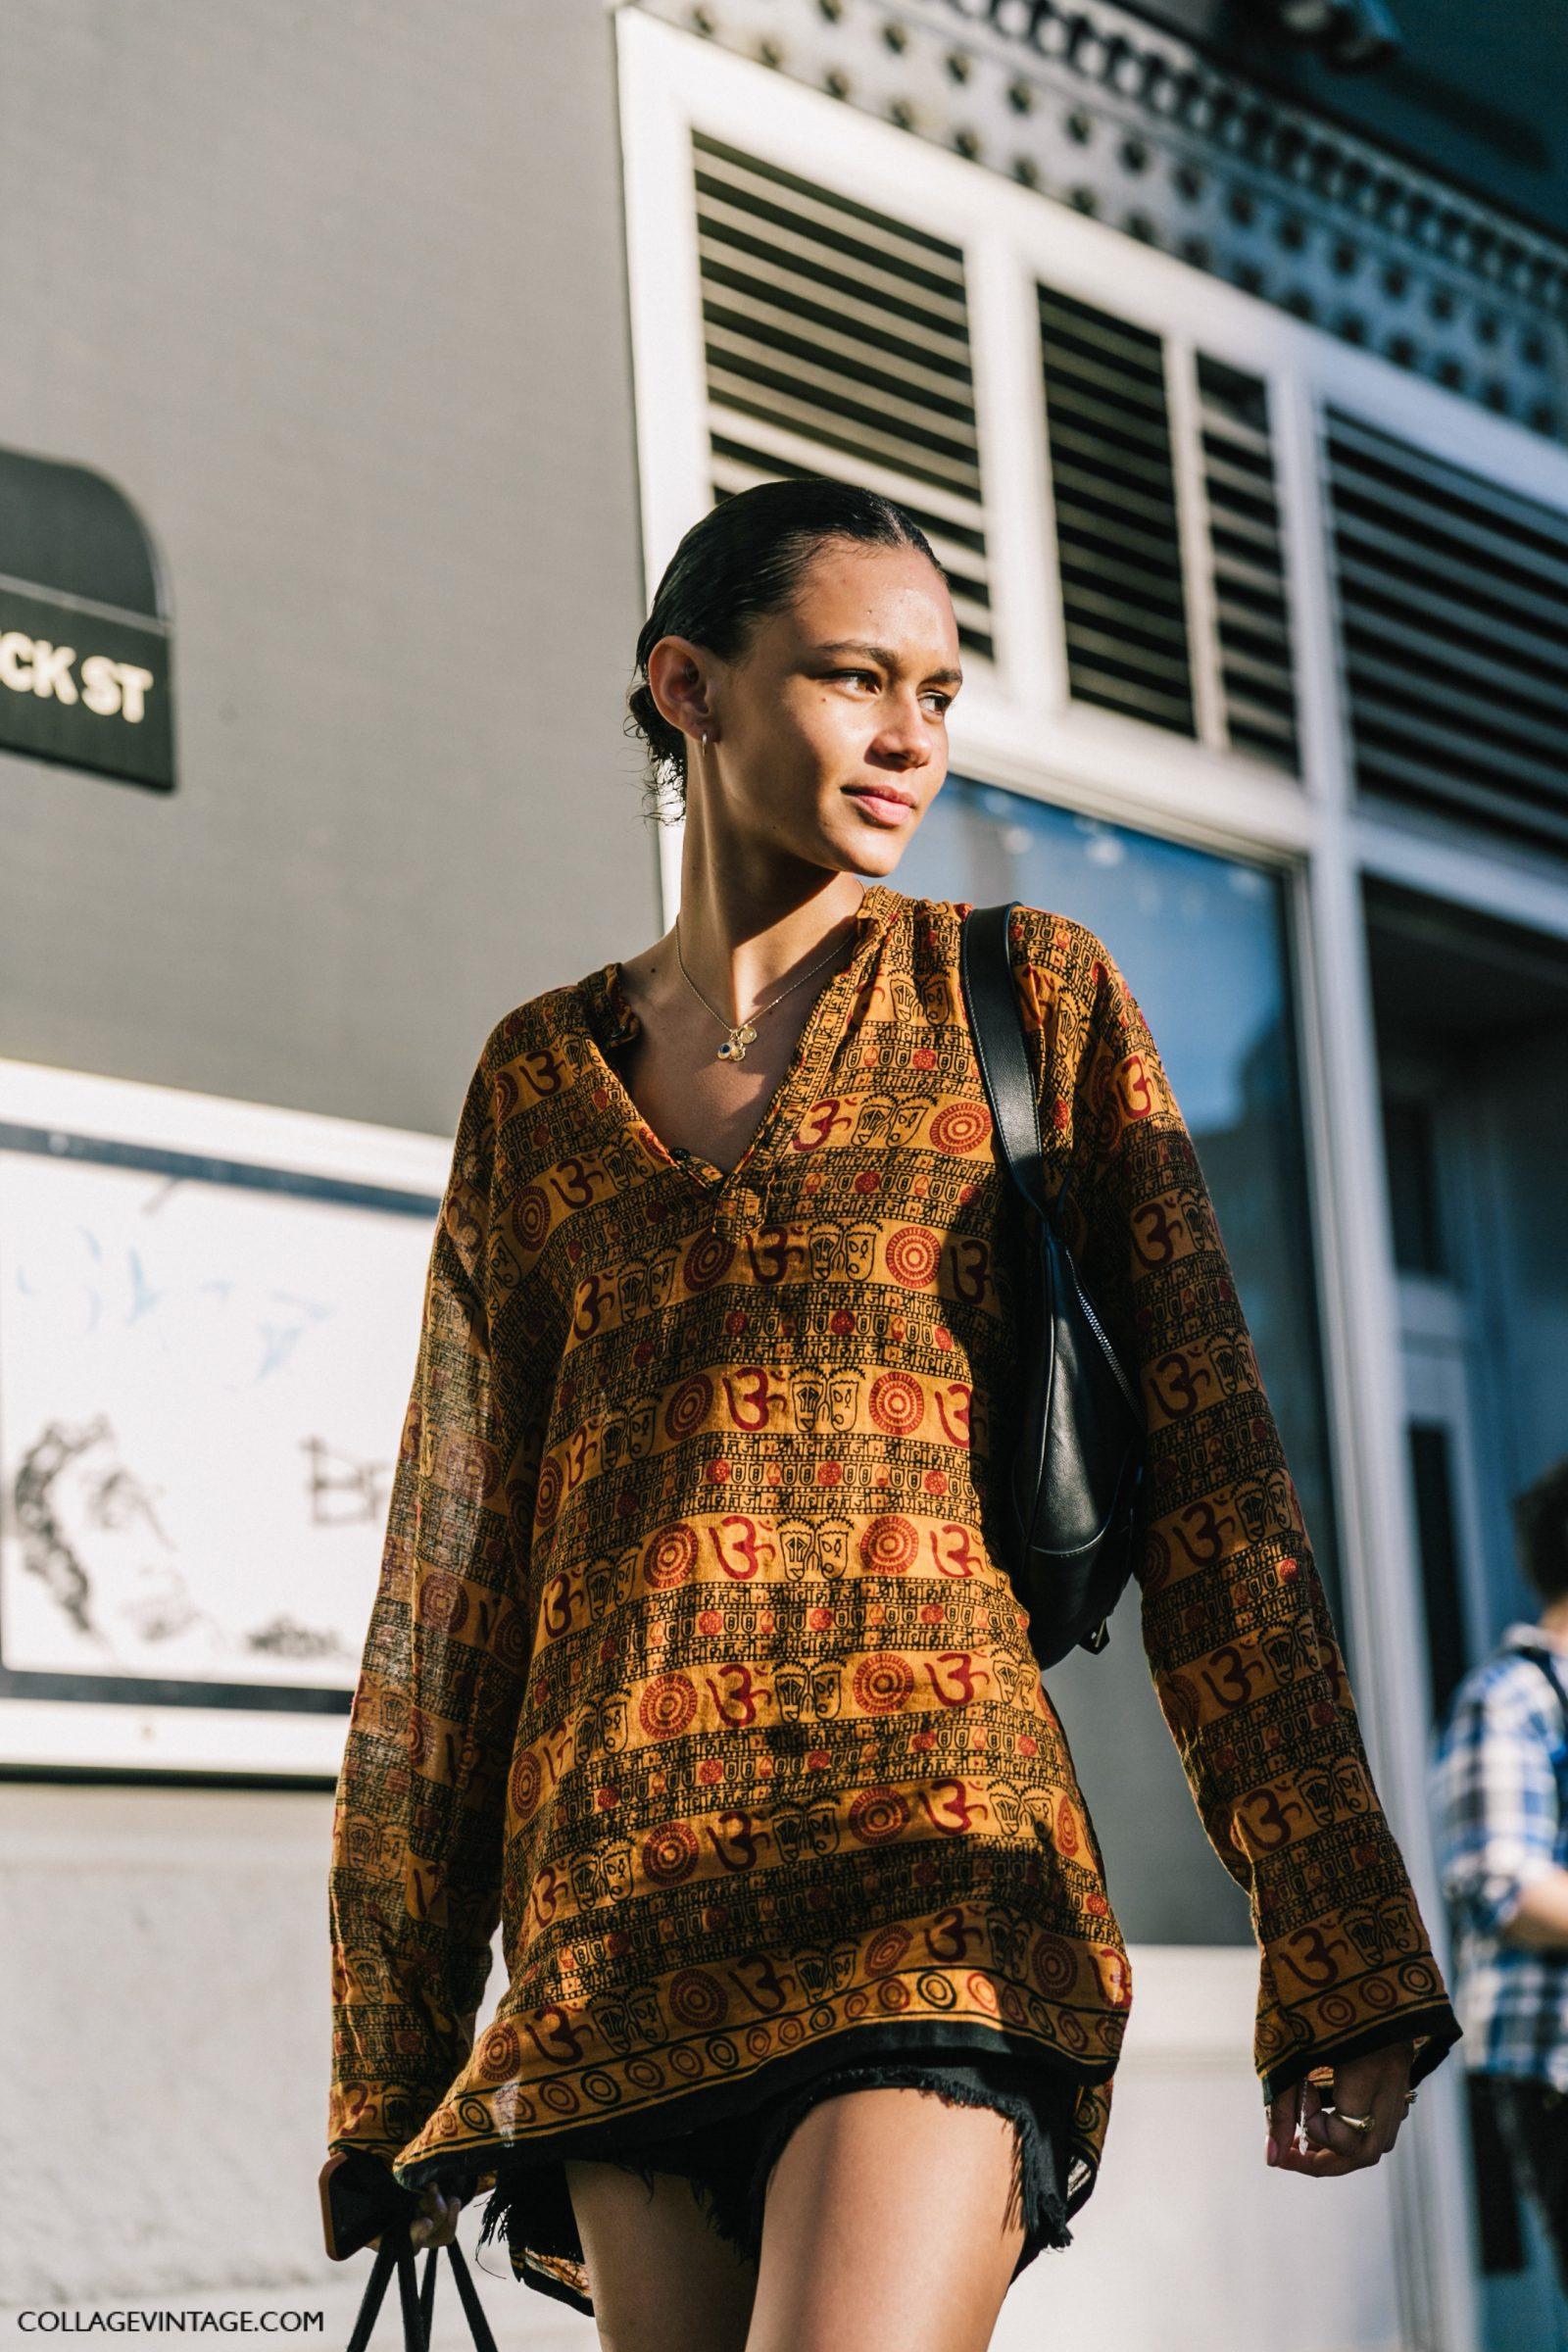 nyfw-new_york_fashion_week_ss17-street_style-outfits-collage_vintage-vintage-atuzarra-105